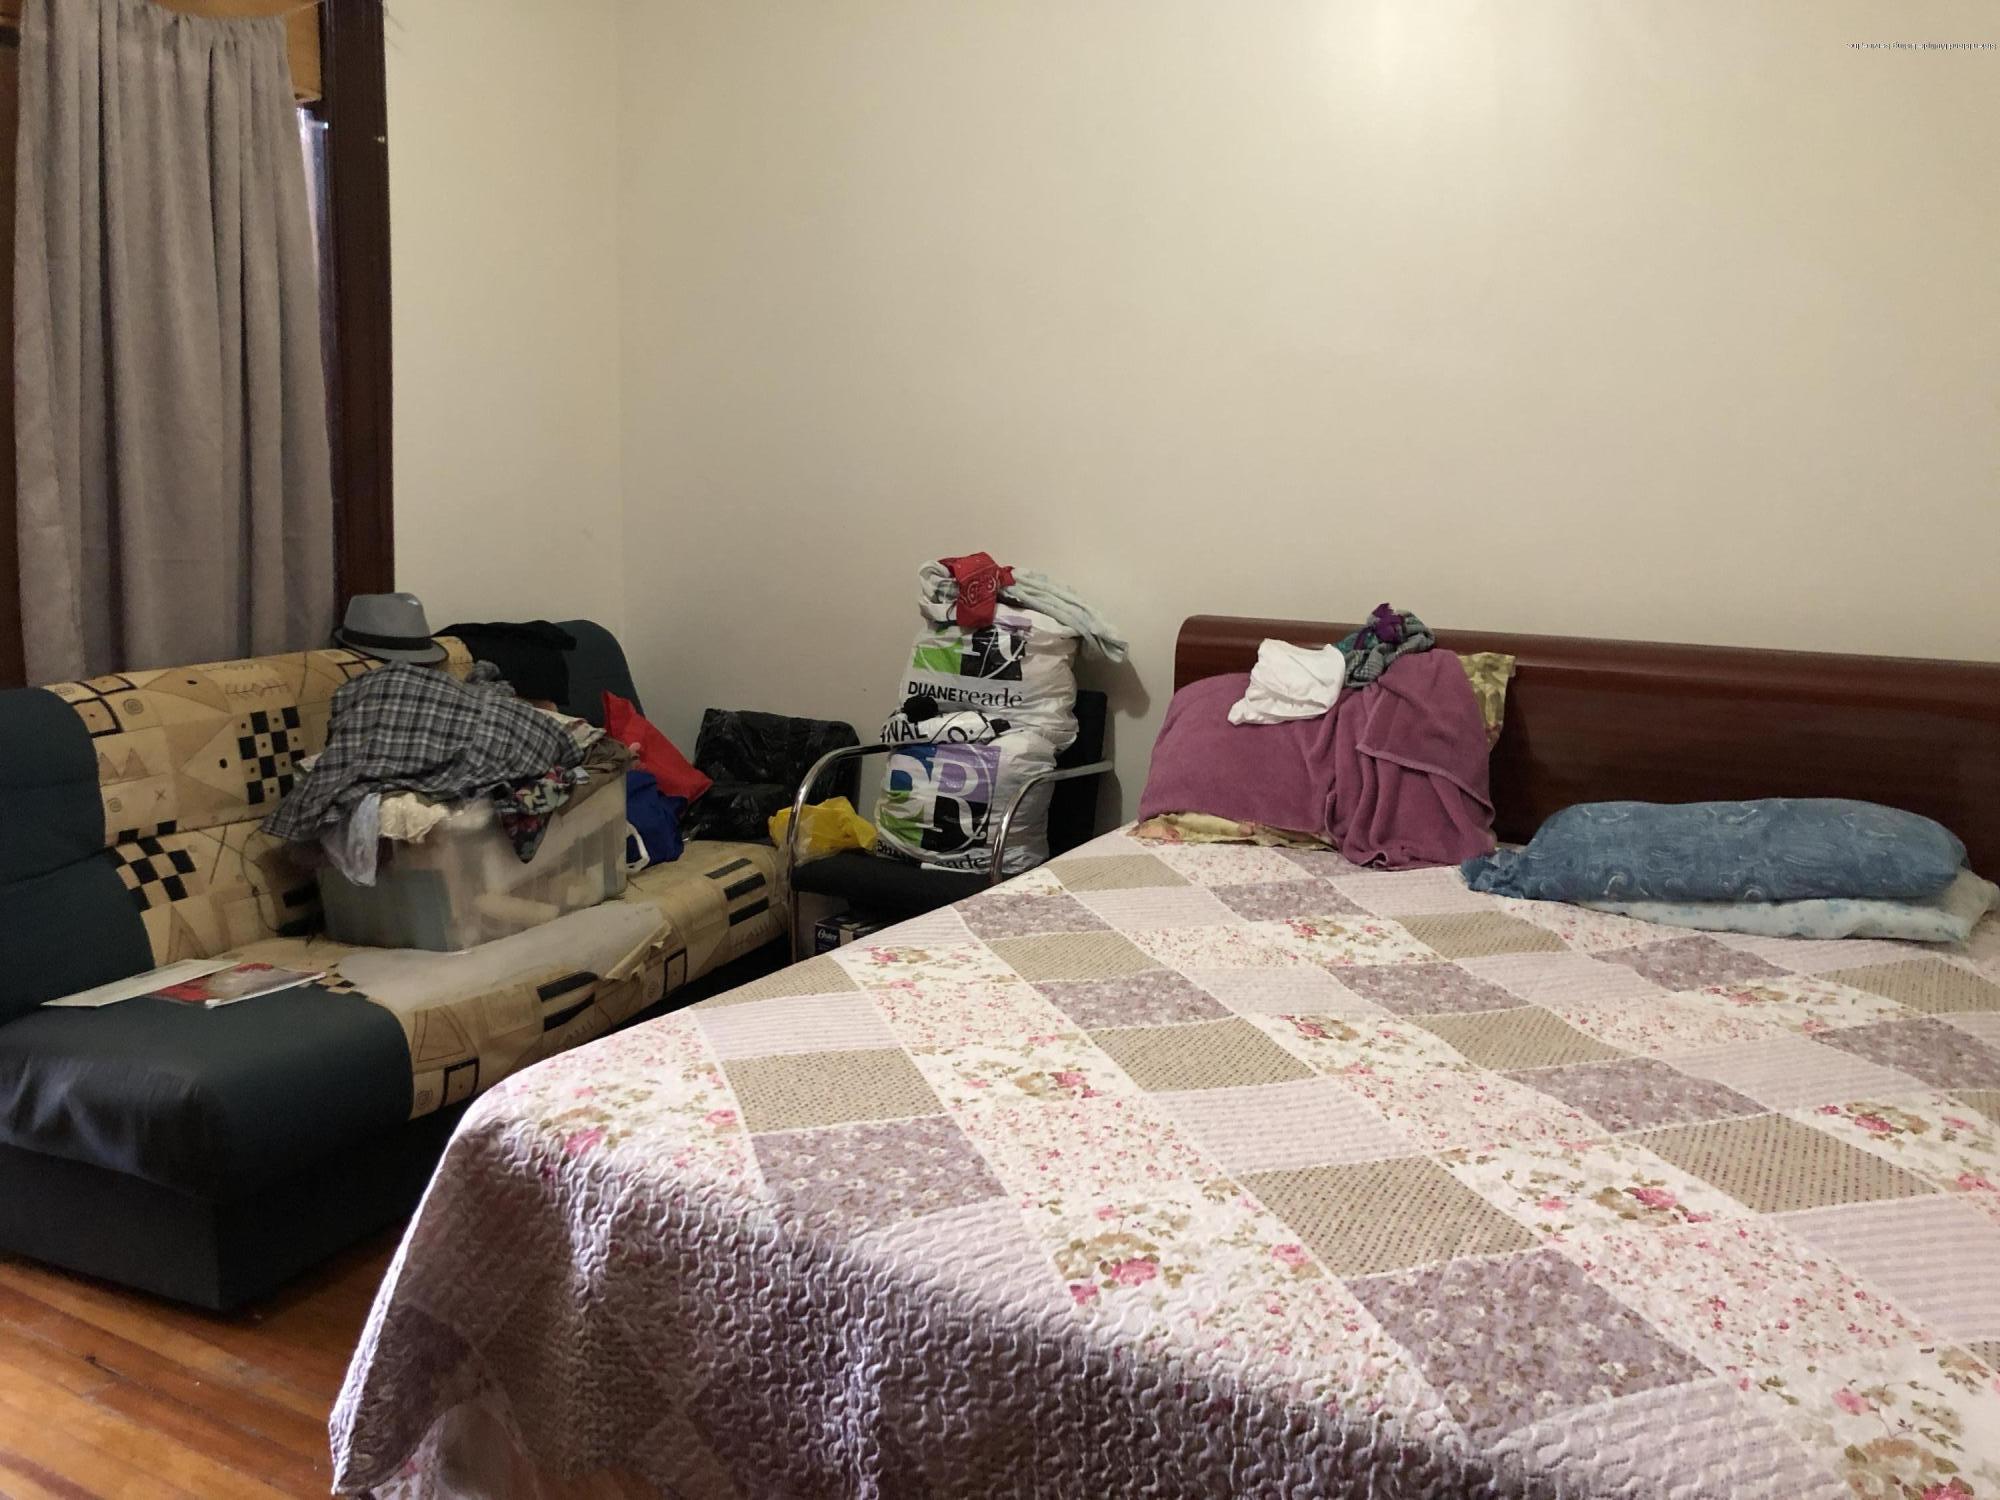 107 Kenilworth Place Brooklyn,New York,11210,United States,6 Bedrooms Bedrooms,4 Rooms Rooms,2 BathroomsBathrooms,Residential,Kenilworth Place,1124676